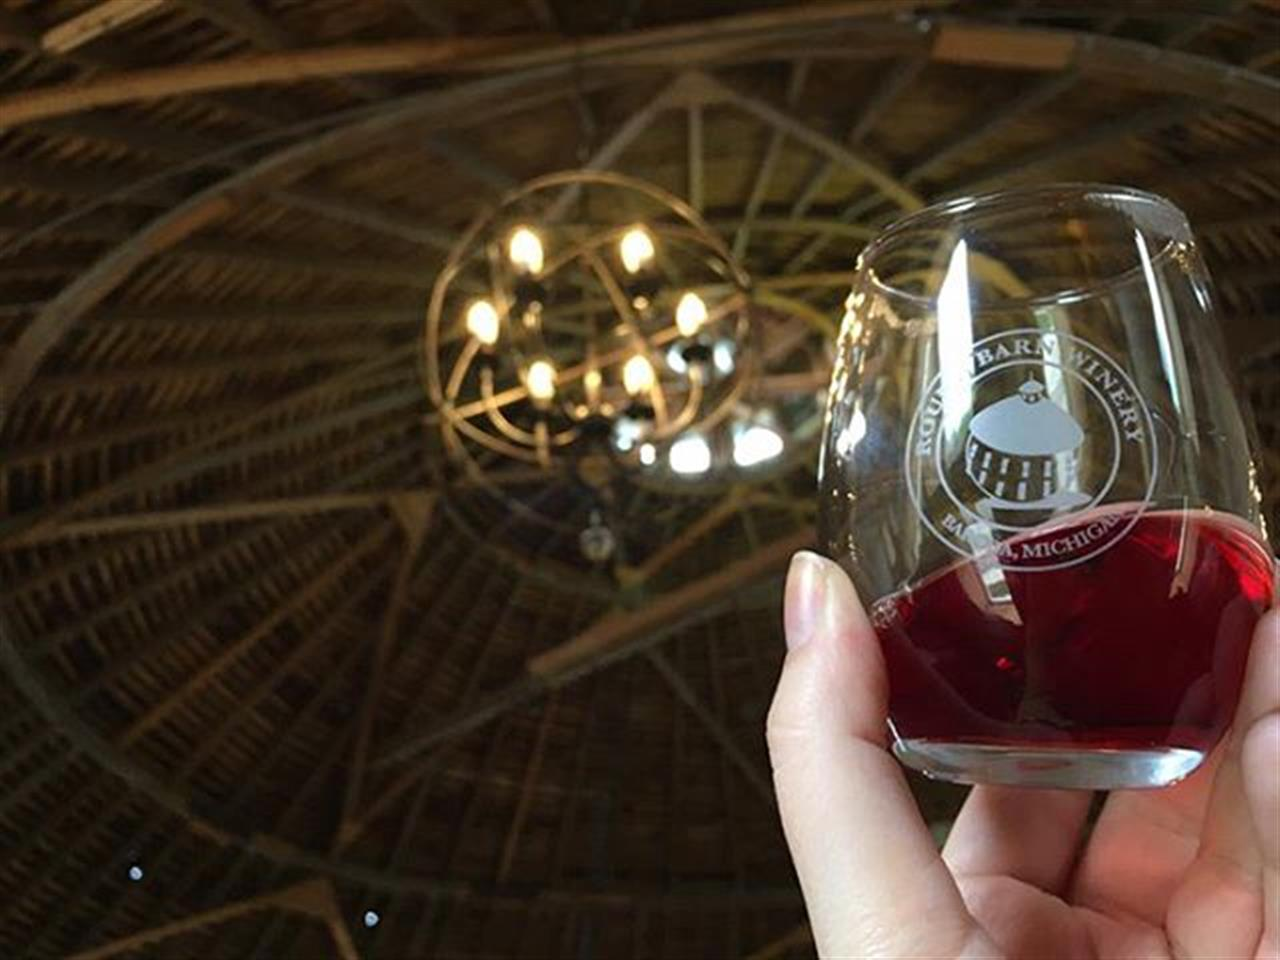 We took the train to New Buffalo and tried some local wine. #daytrip #amtrak #newbuffalo #roundbarn #wine #winetasting  #chicago #leadingrelocal #bairdwarner